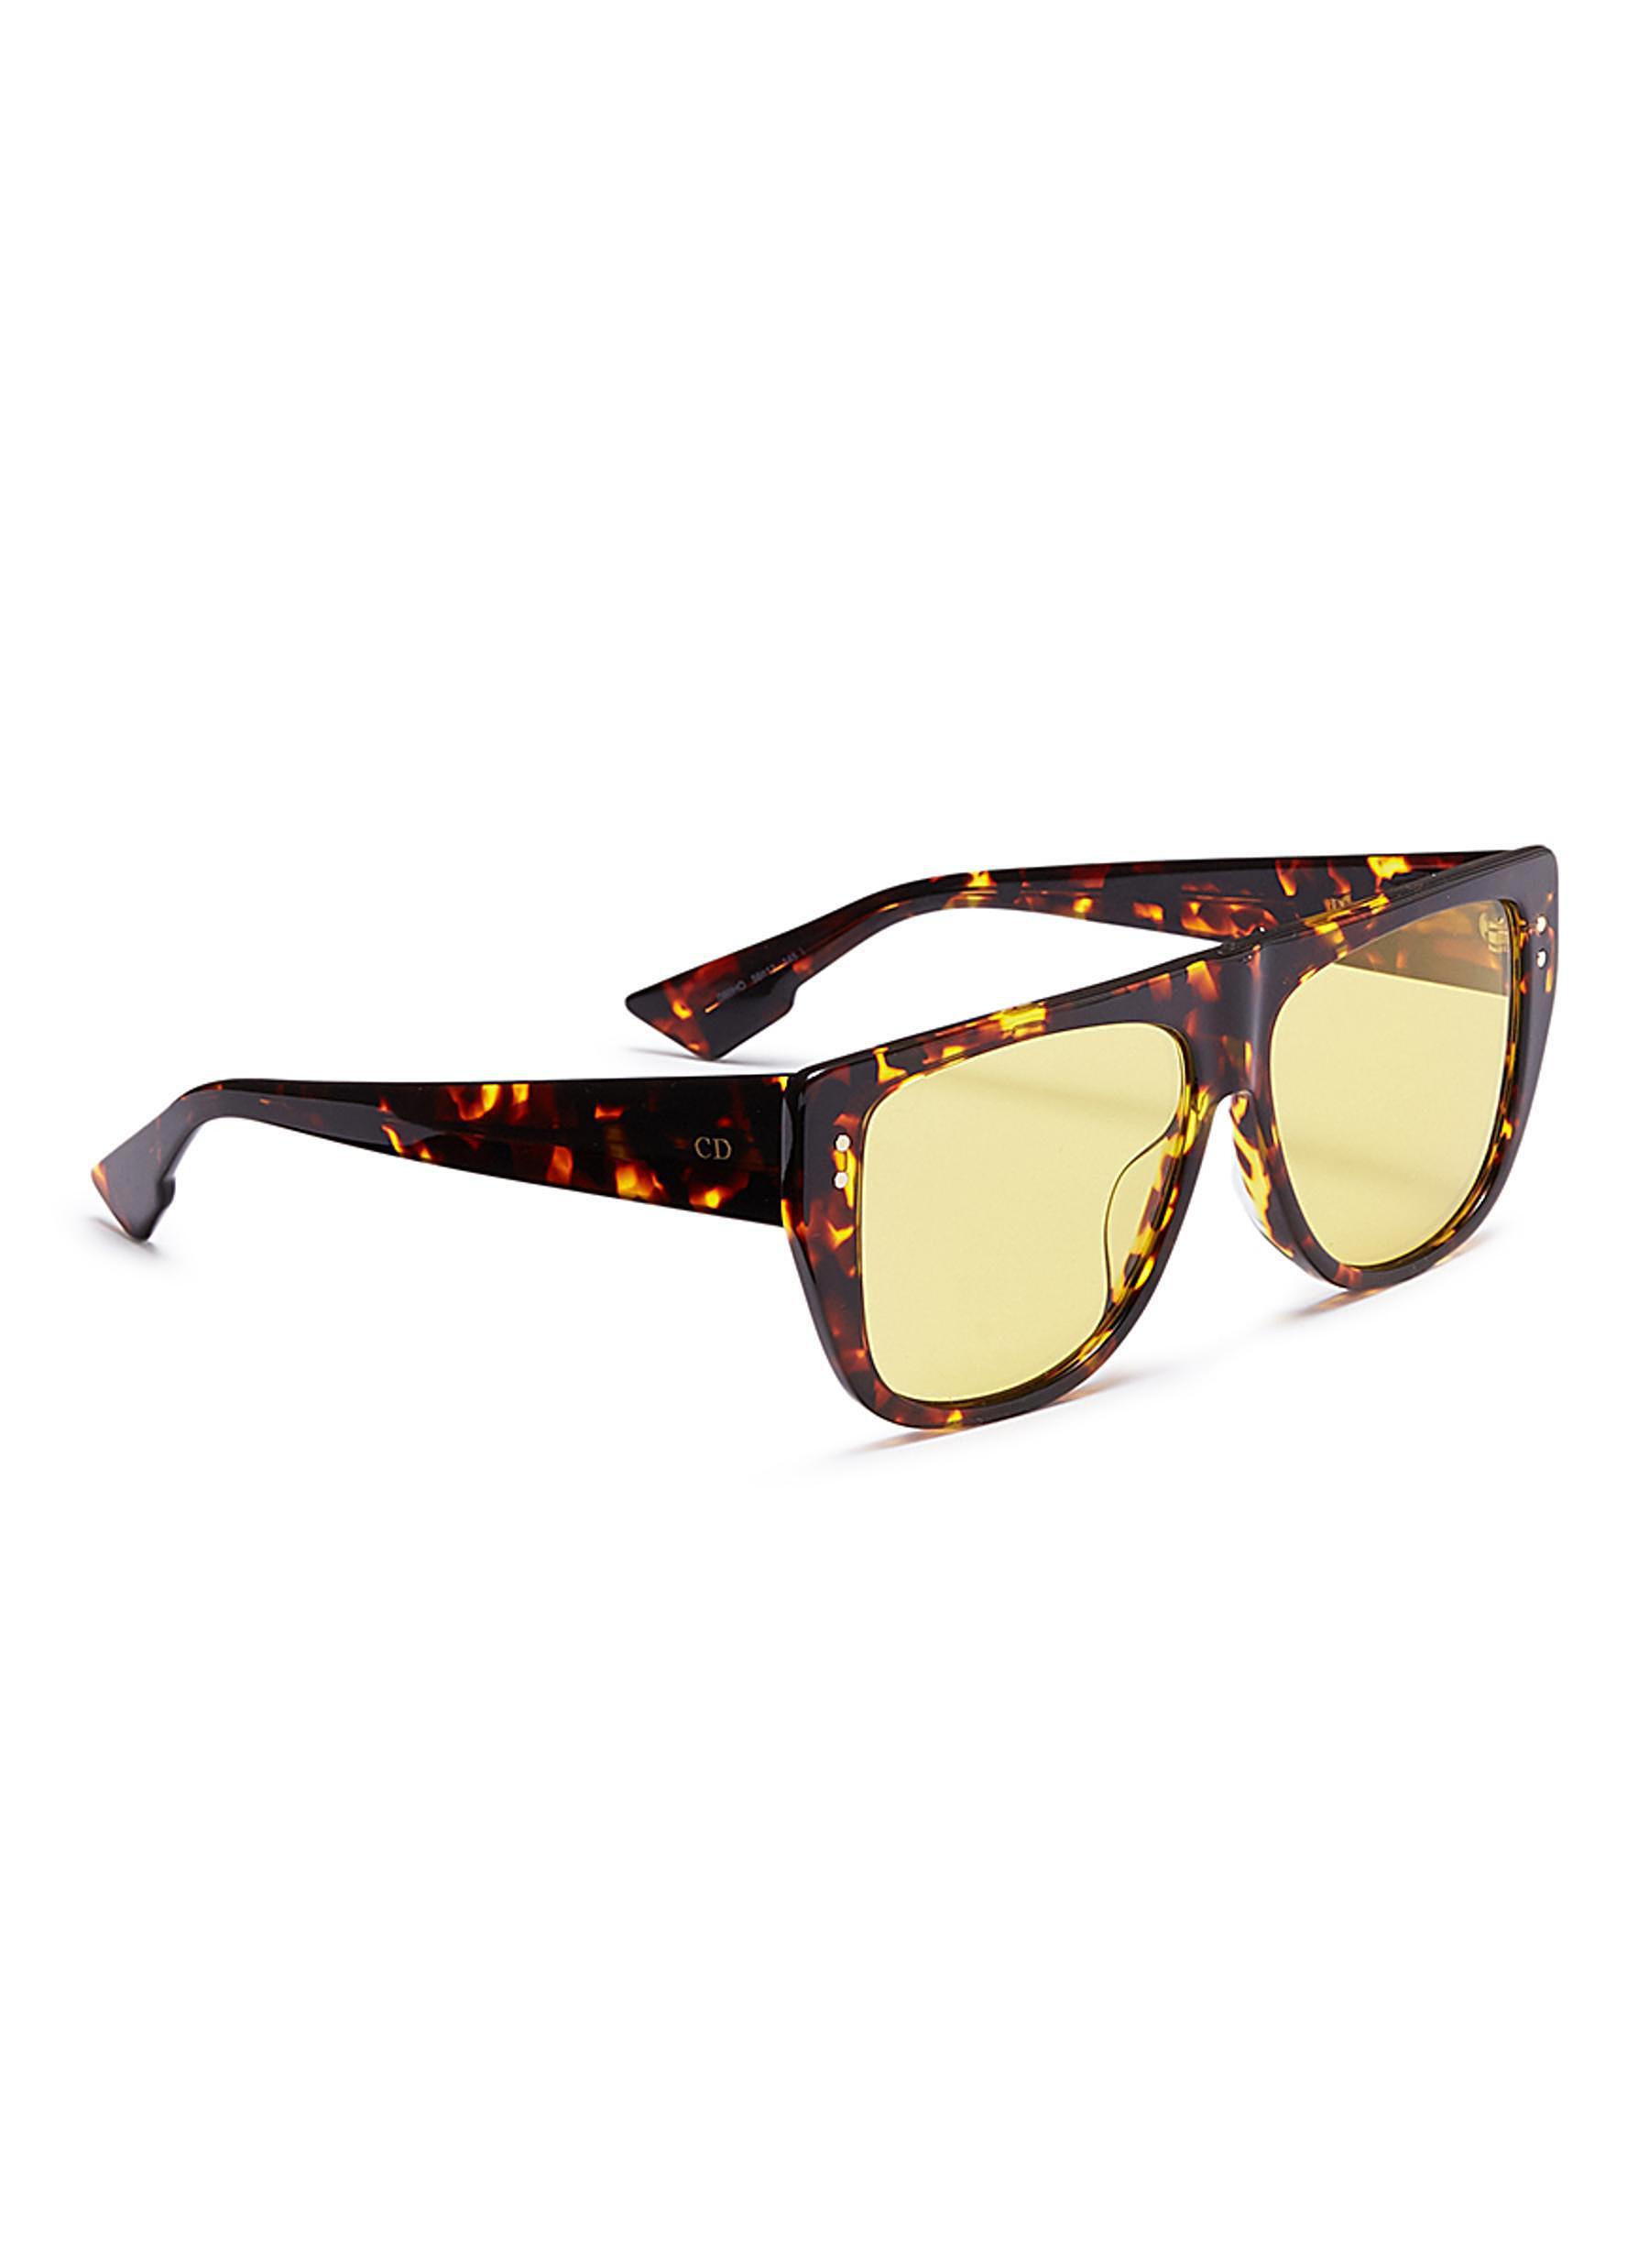 83e03ff586 Dior - Yellow   Club 2  Detachable Visor Acetate D-frame Sunglasses - Lyst.  View fullscreen